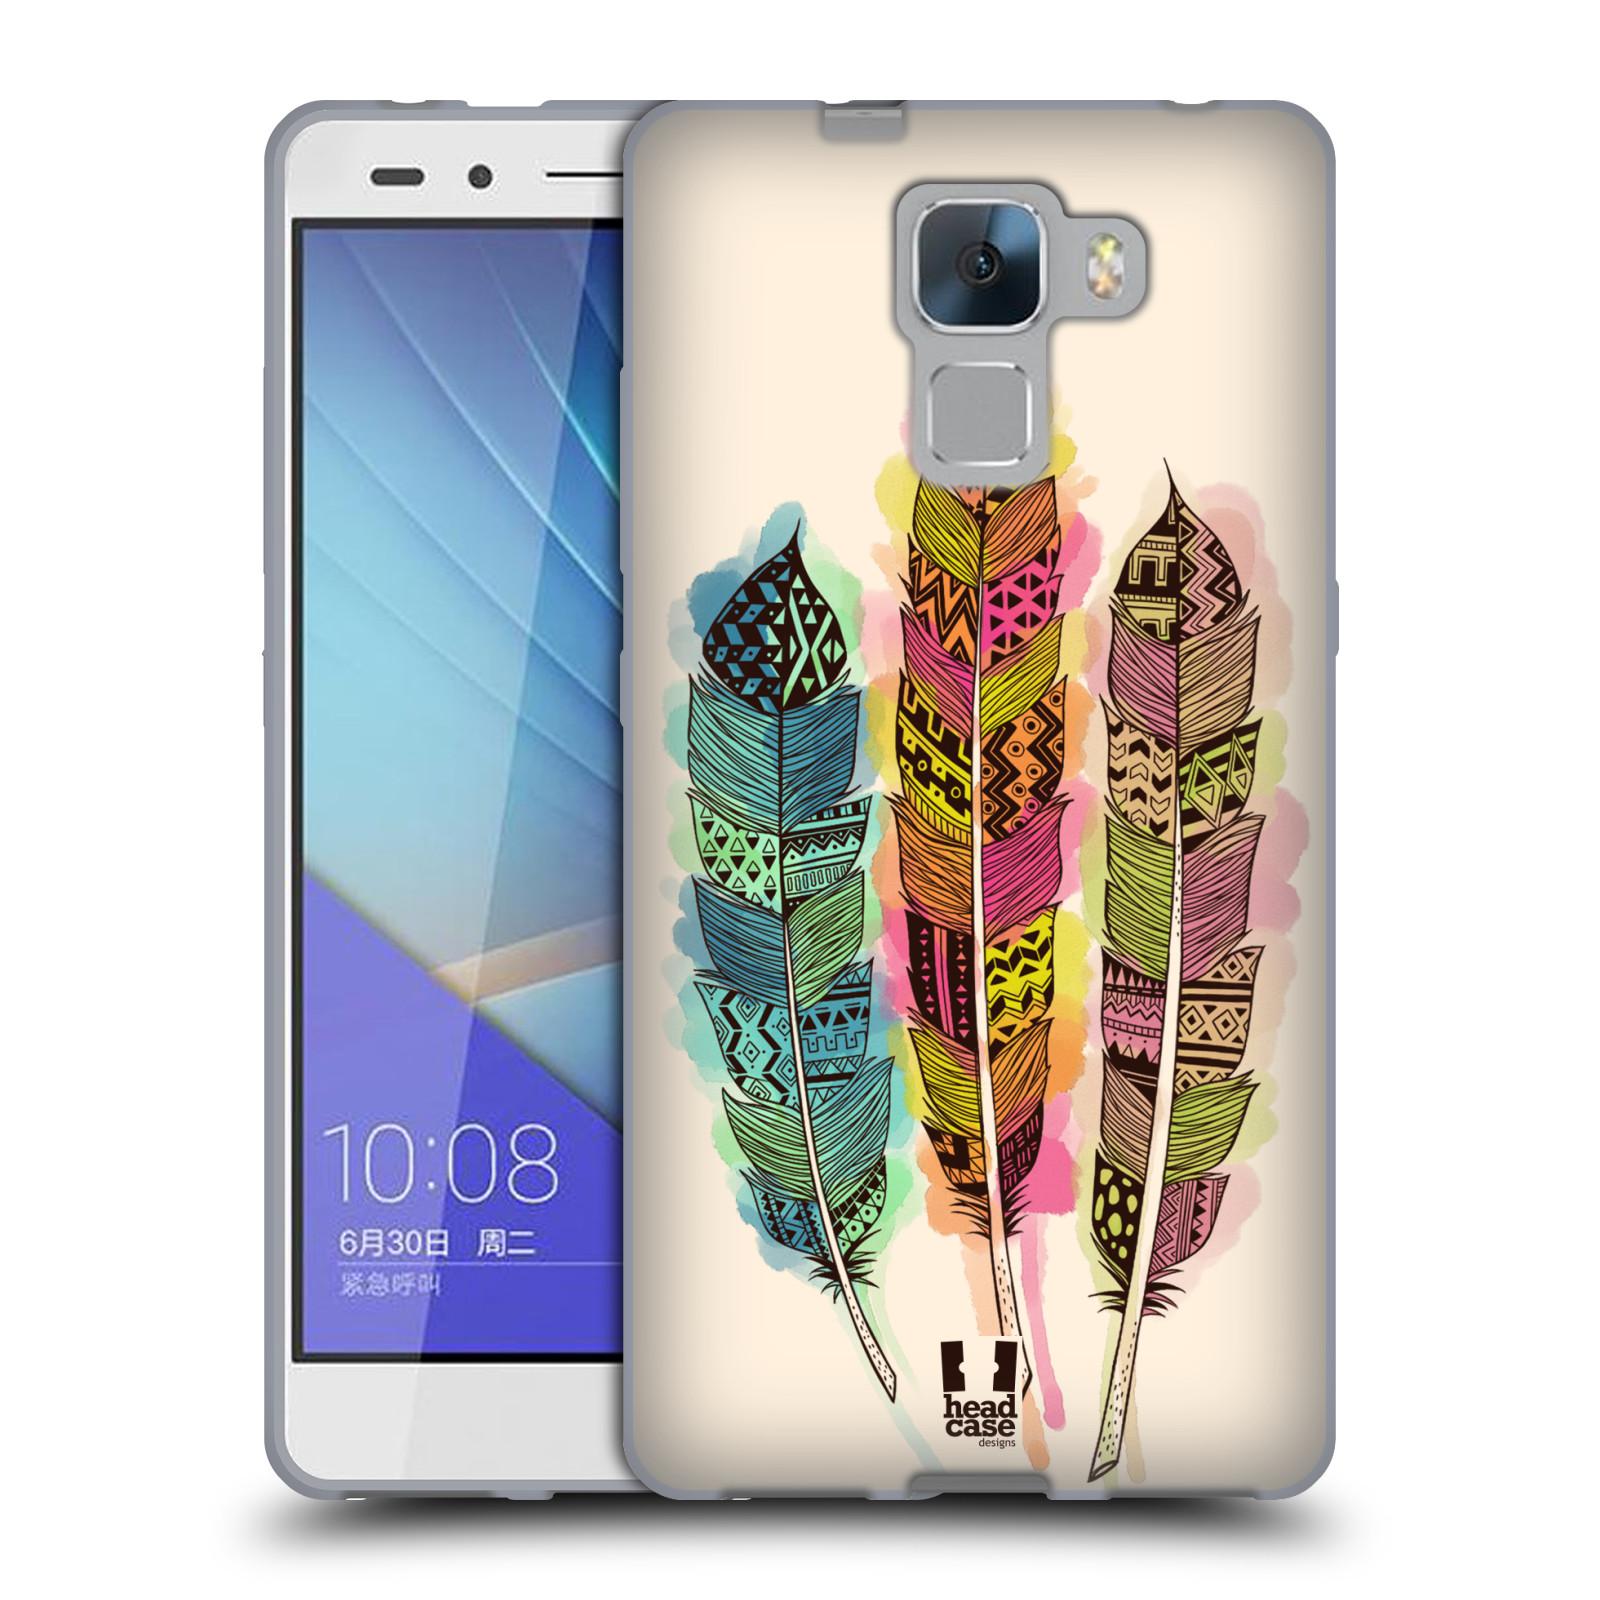 Silikonové pouzdro na mobil Honor 7 HEAD CASE AZTEC PÍRKA SPLASH